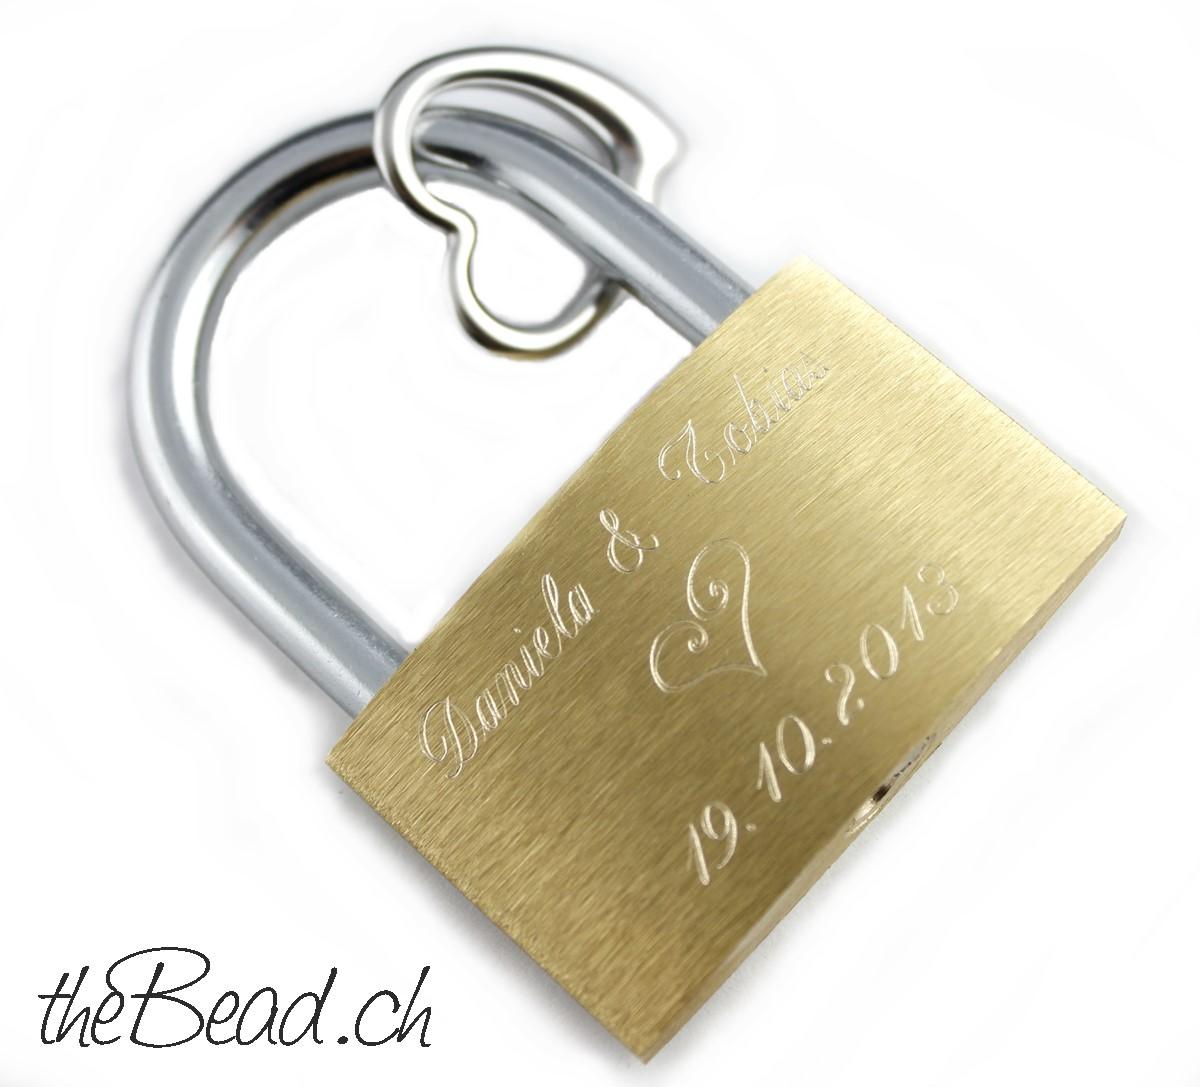 Liebesschloss mit Gravur in schweizer Liebesschloss Onlineshop